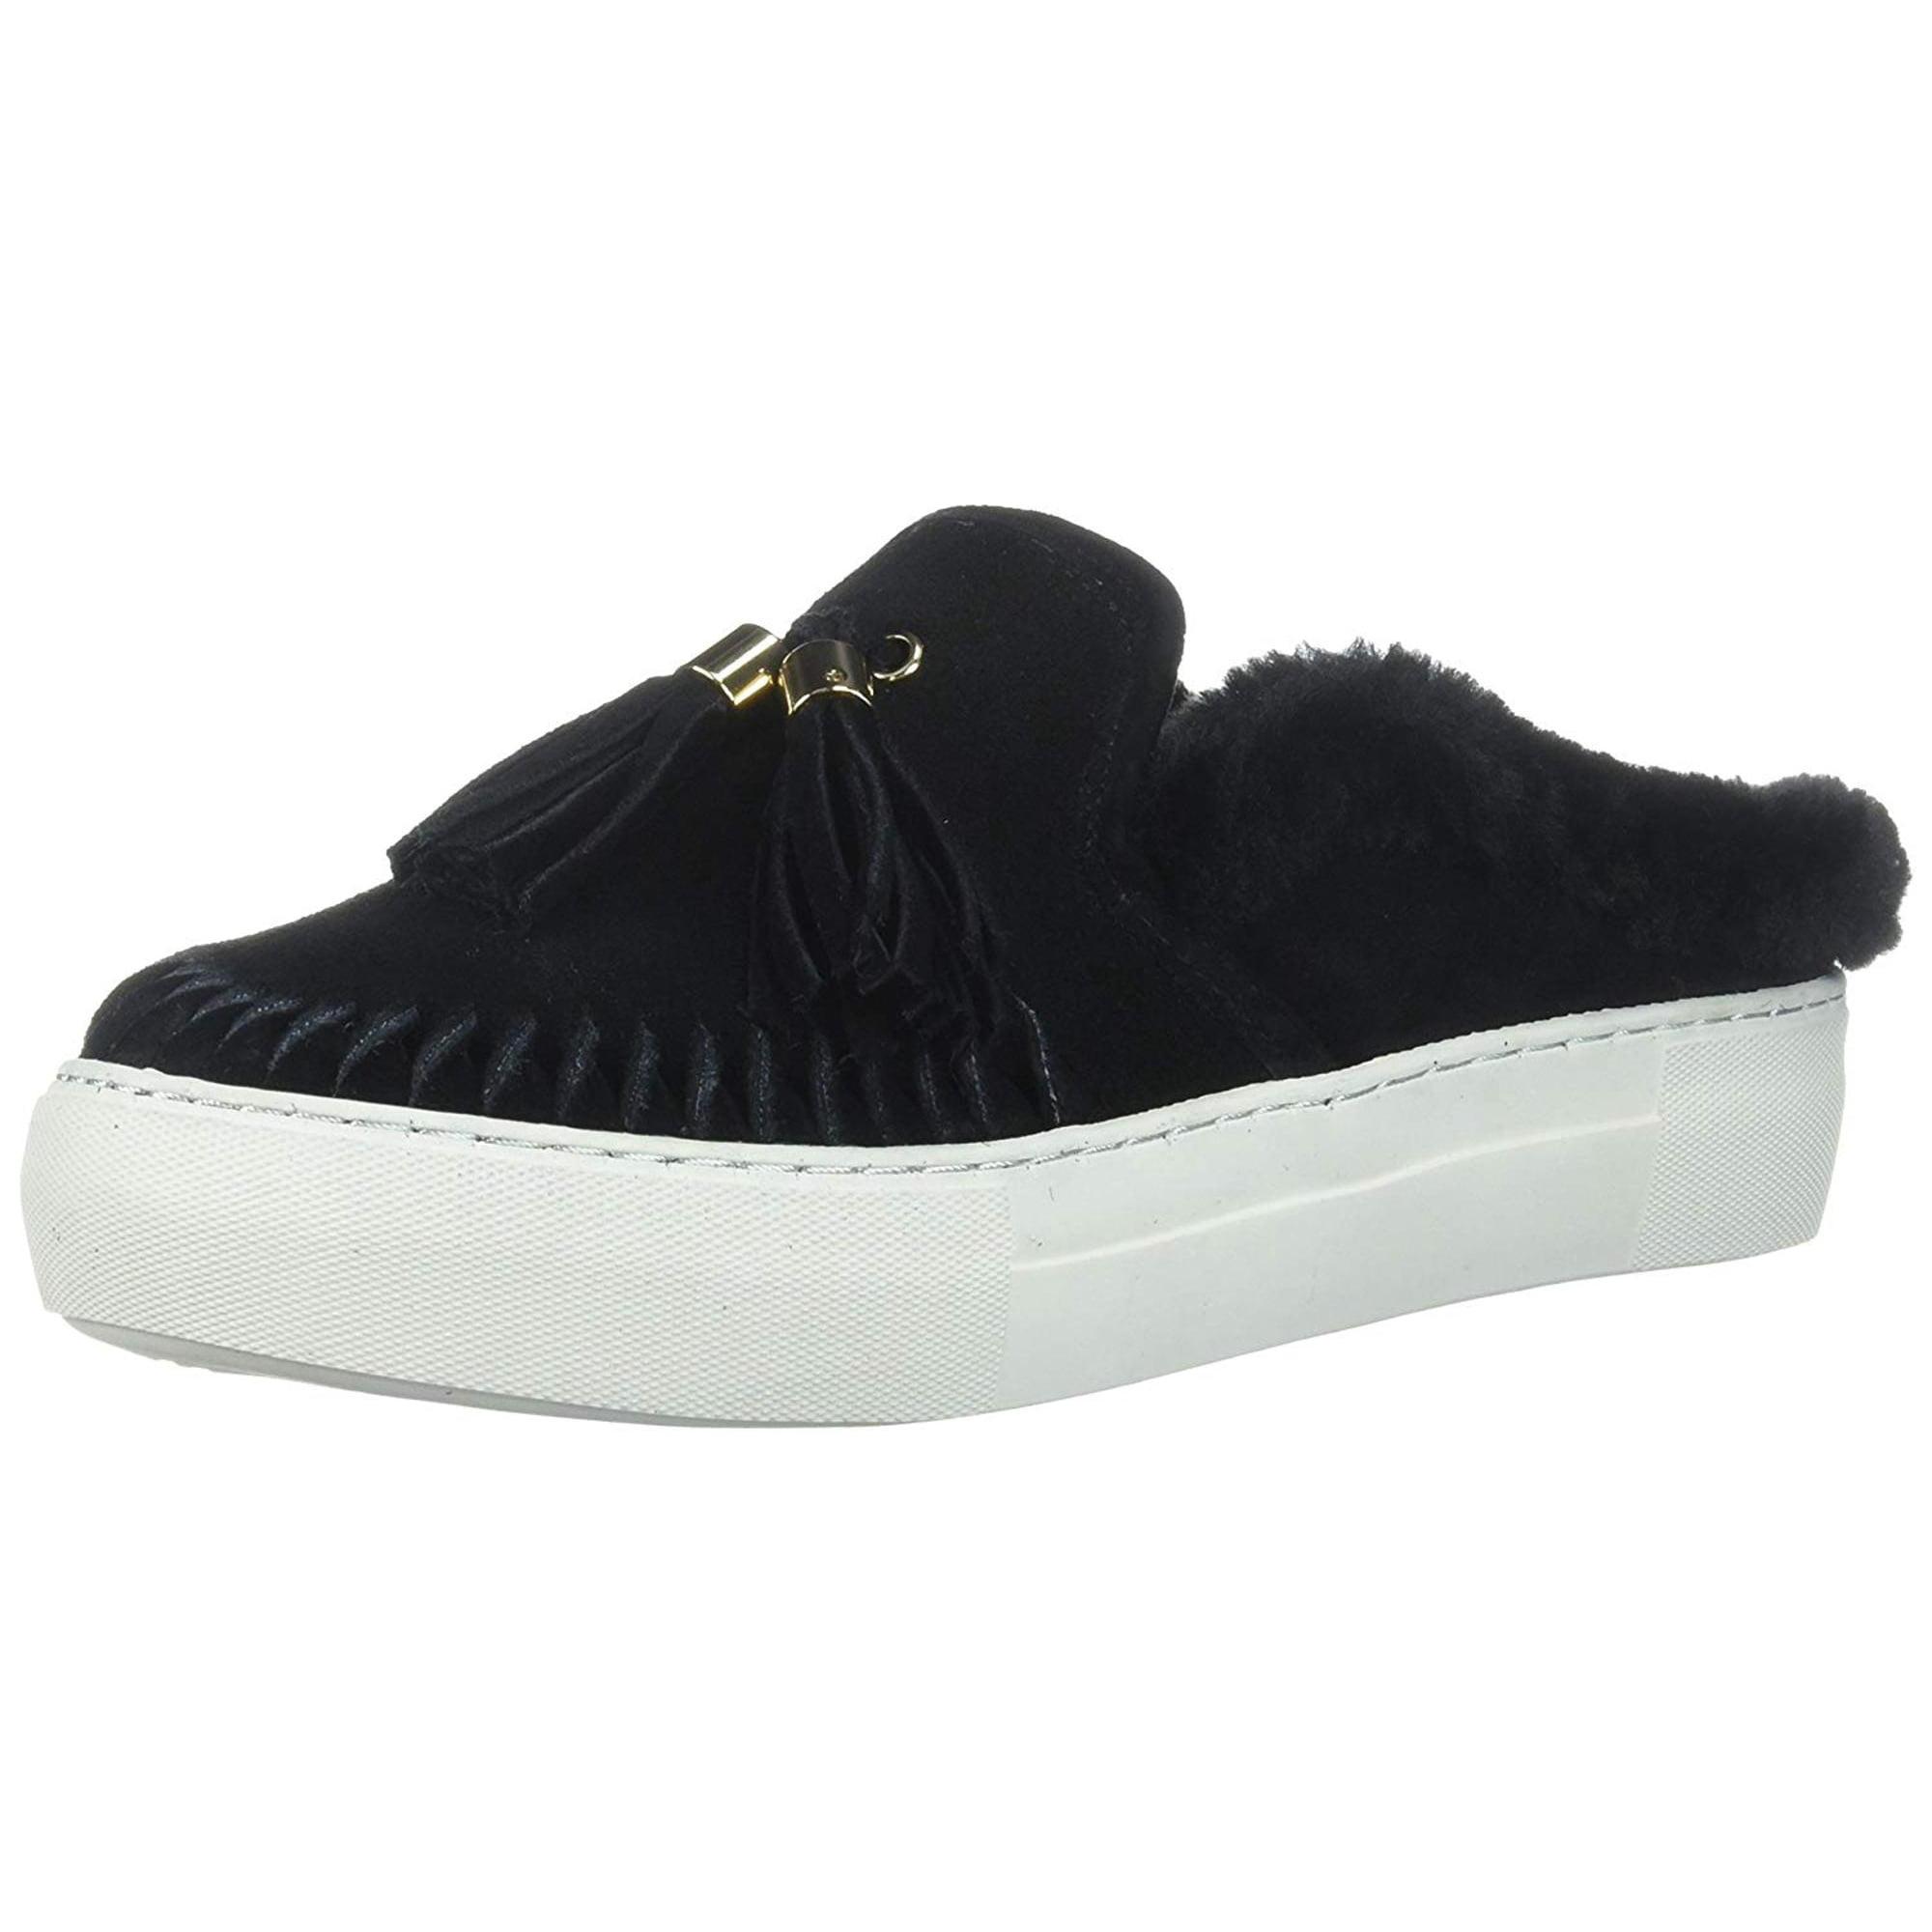 65109ffb24151 J Slides Womens Azul Low Top Slip On Fashion Sneakers | Walmart Canada